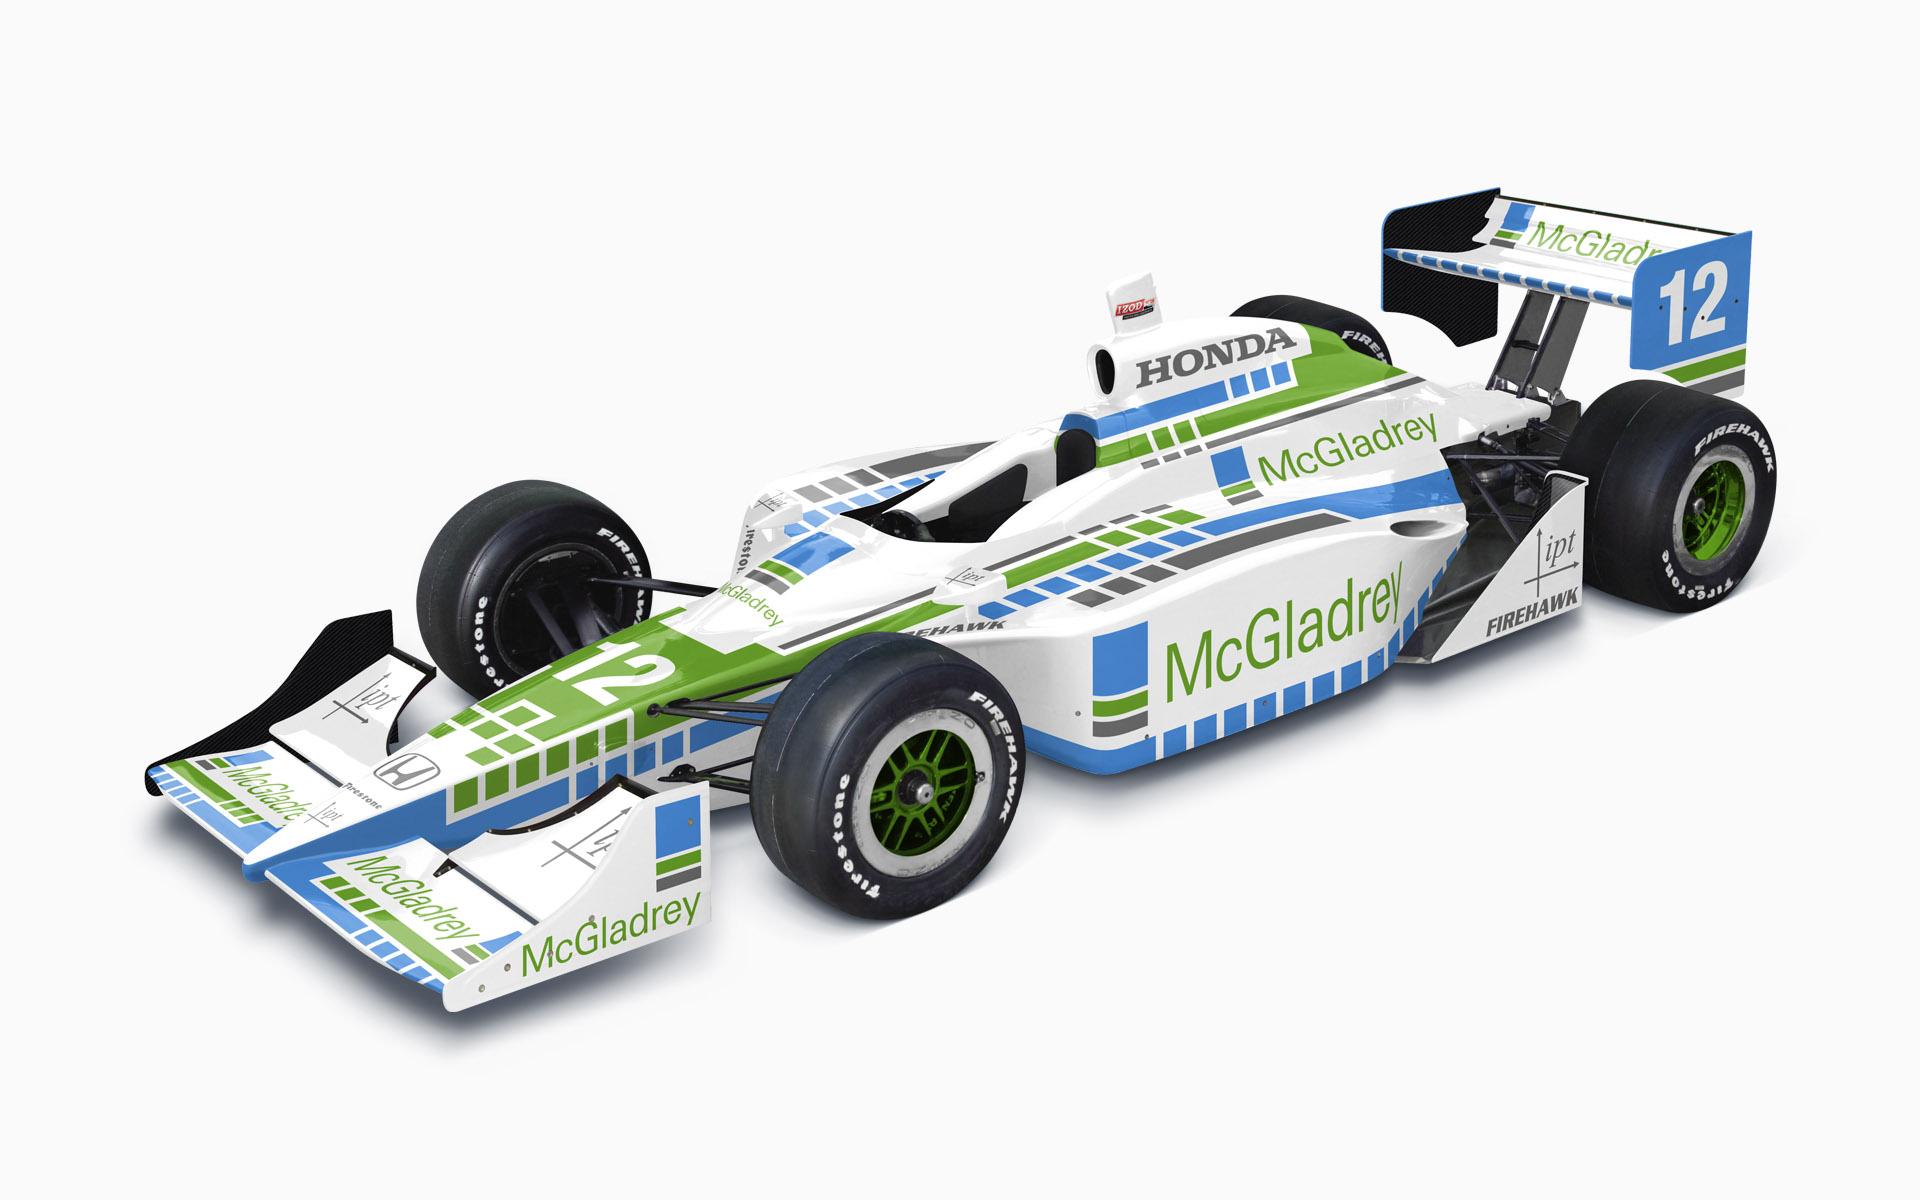 2009 IPT McGladrey Dallara Honda IndyCar Livery Visualization